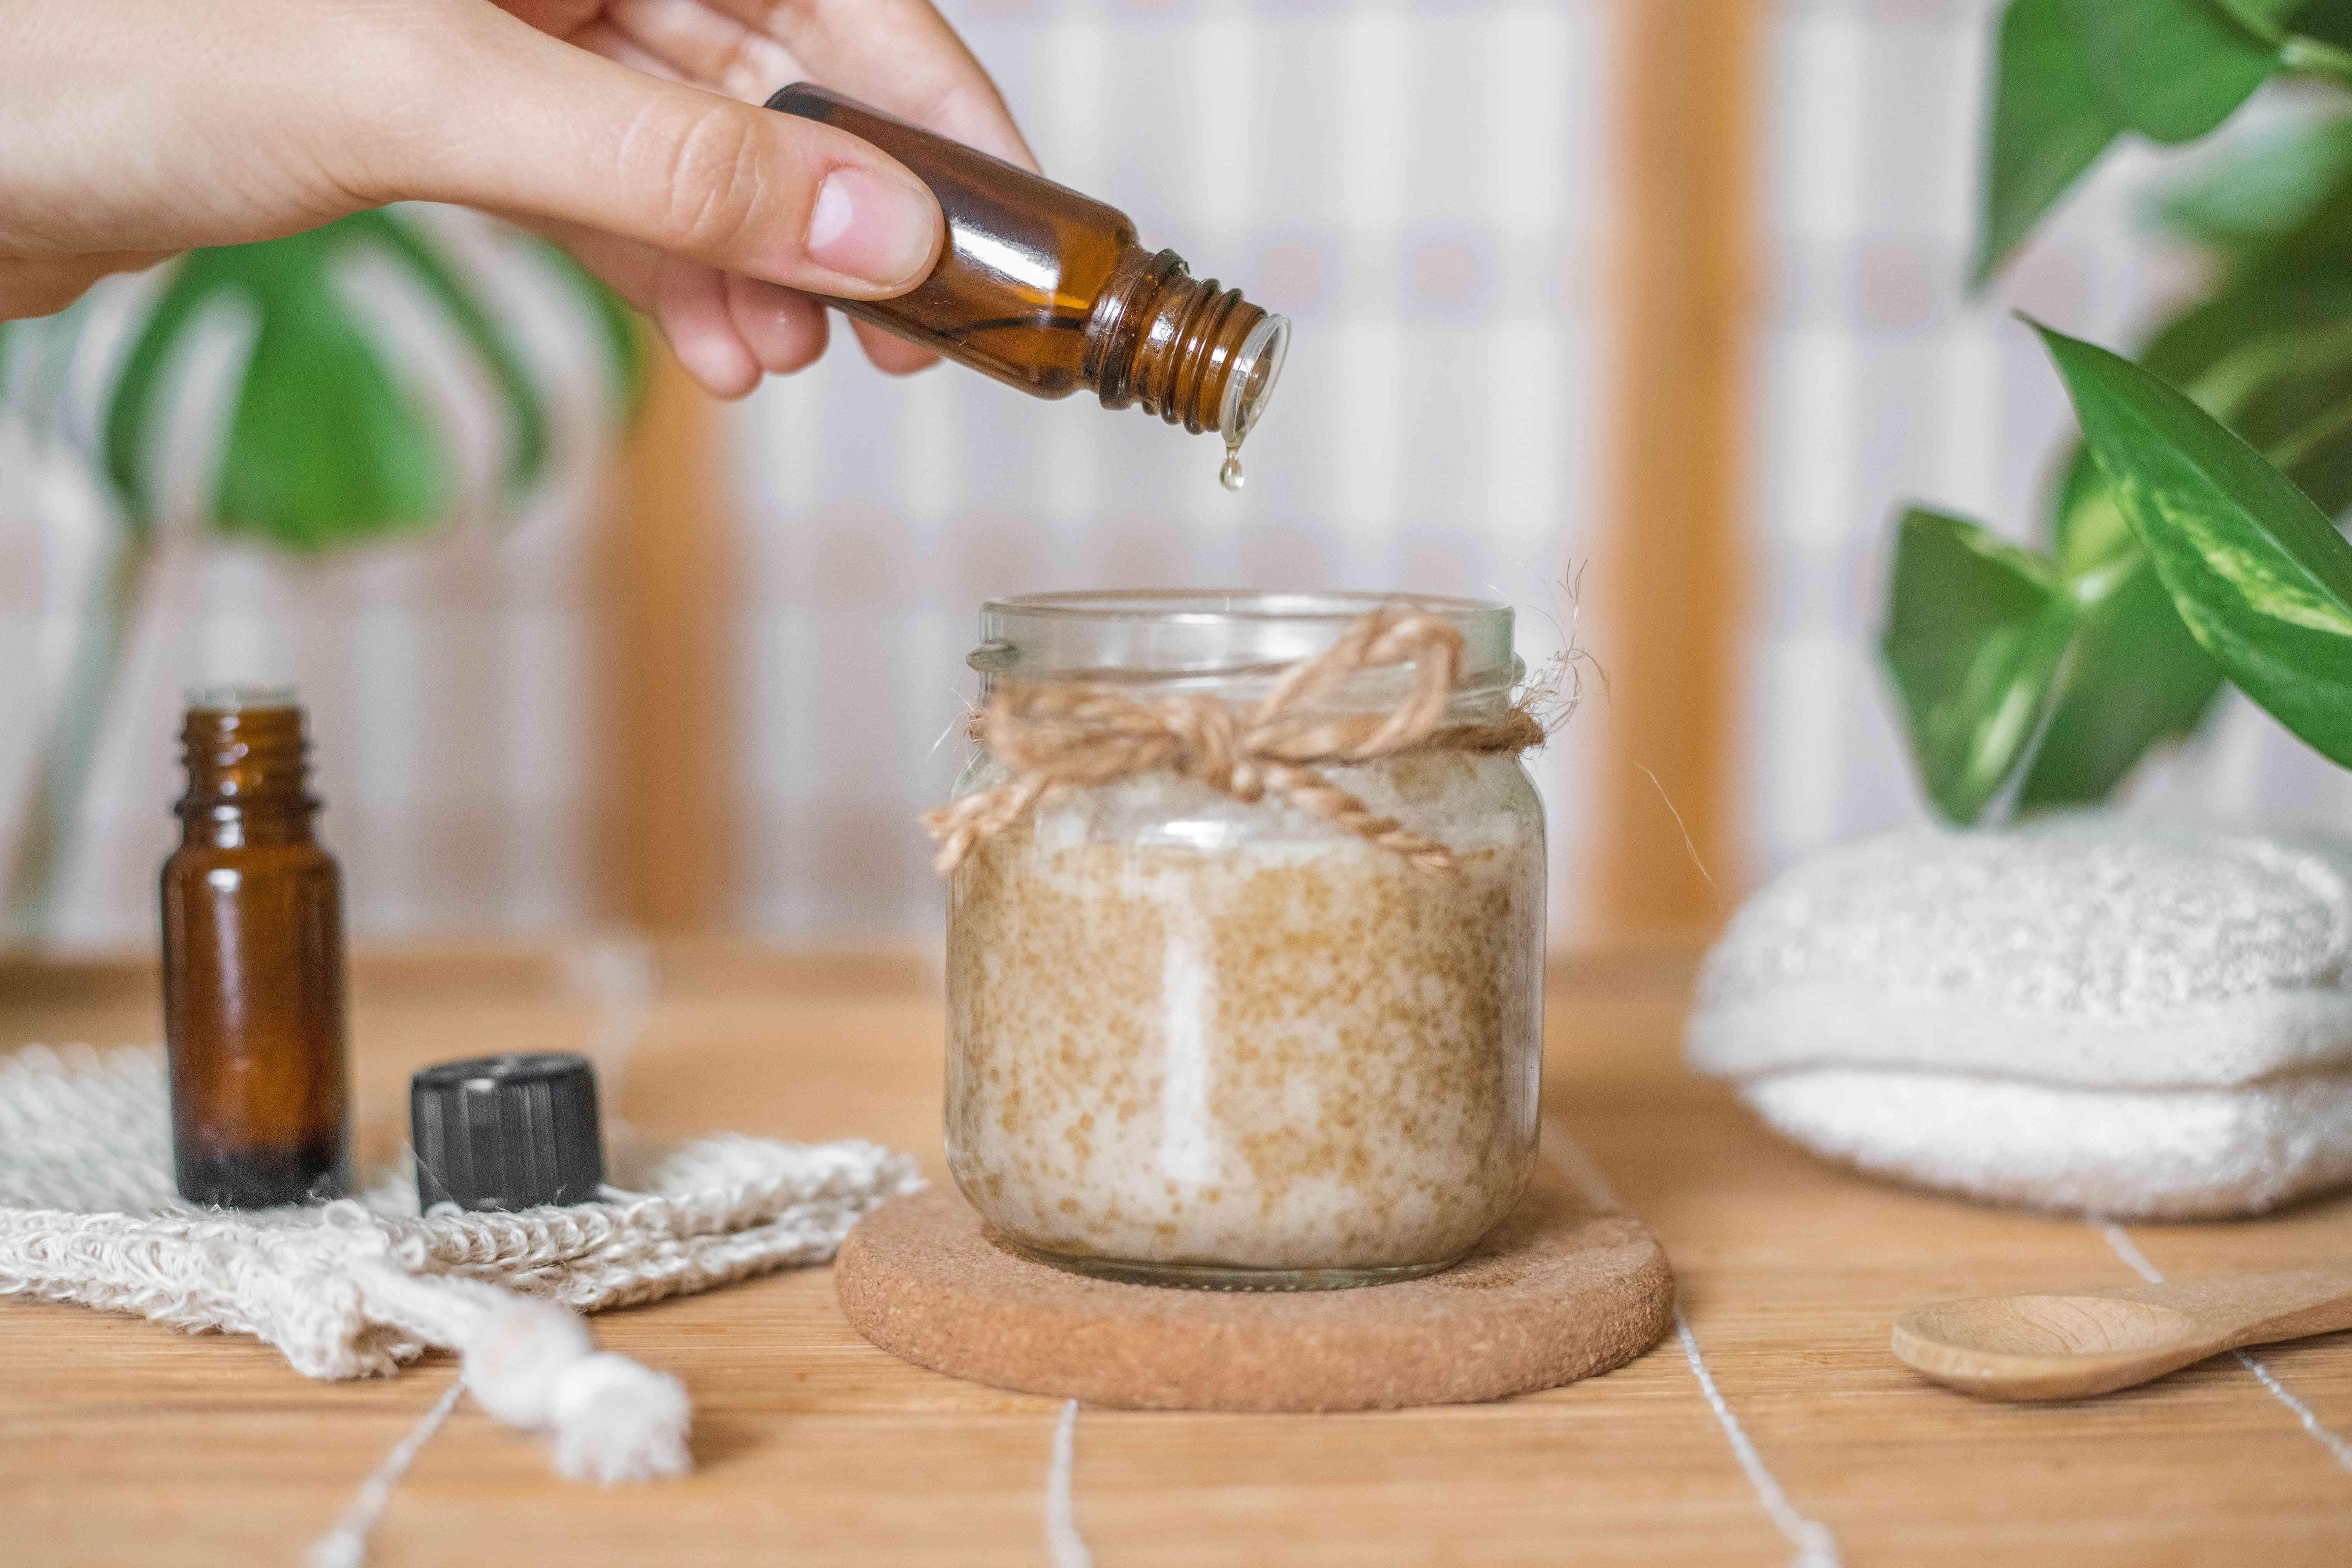 hand adds drop of essential oil to diy homemade coconut sugar scrub in glass jar